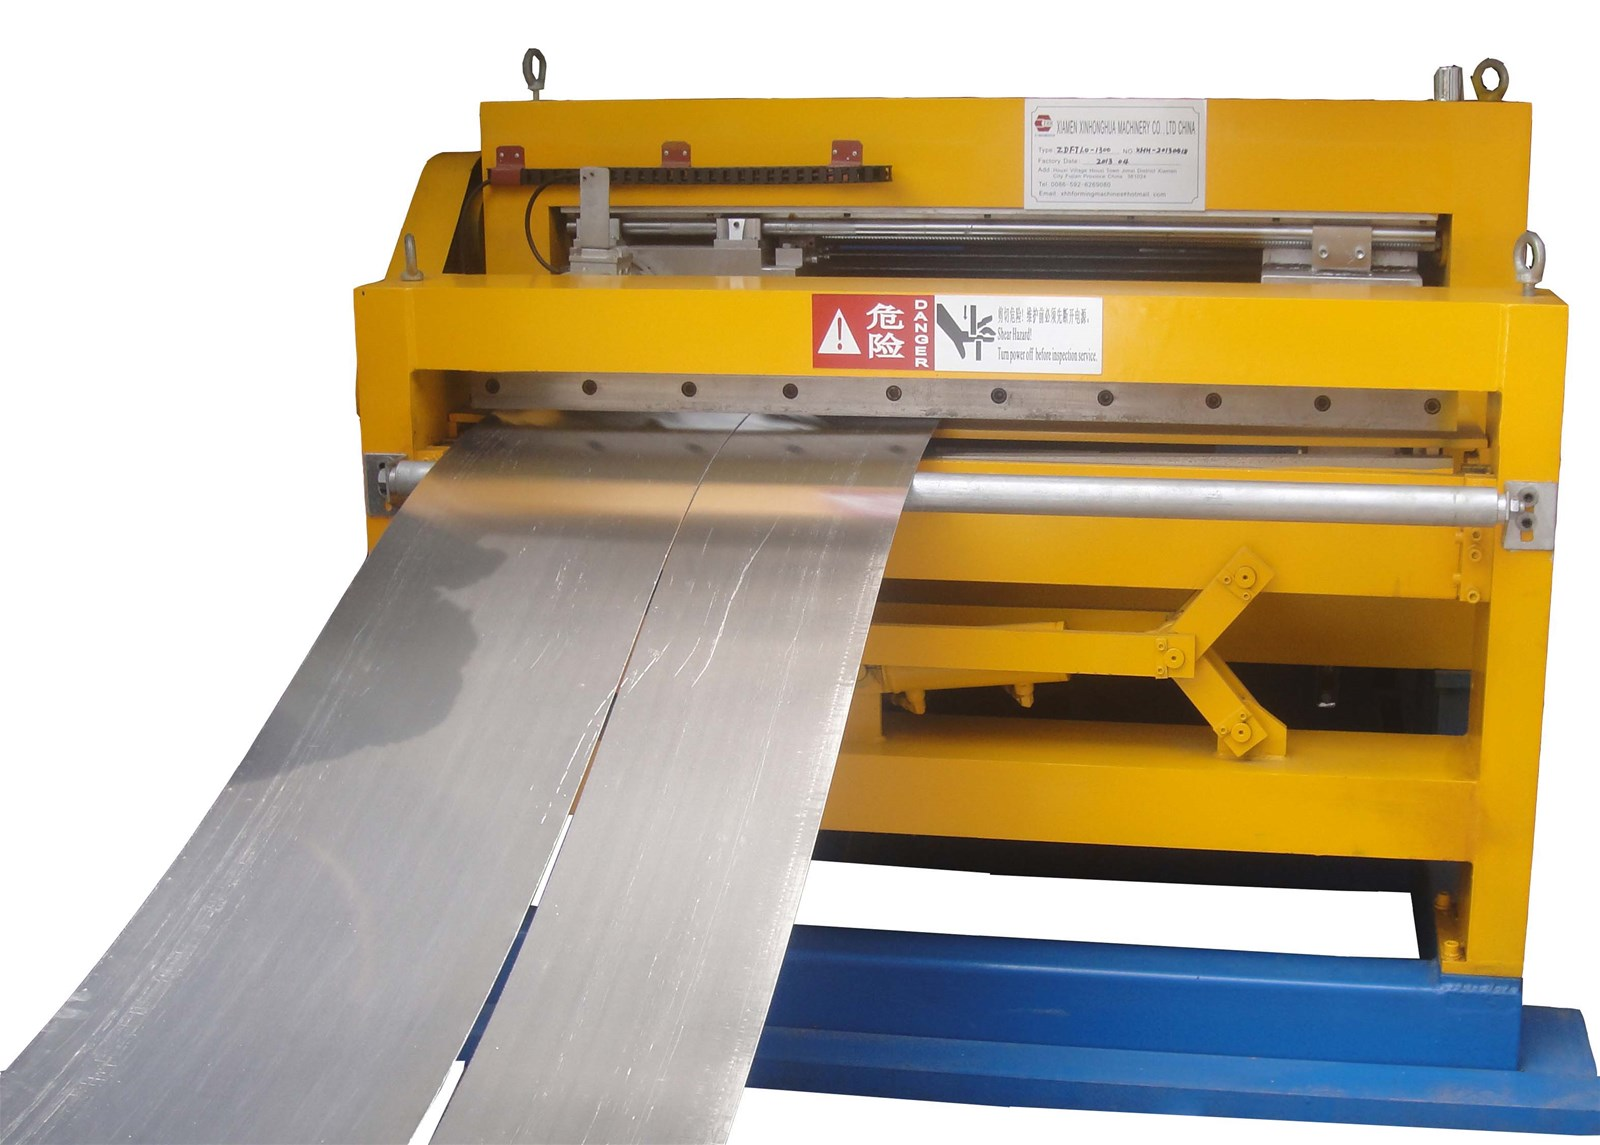 ST1 0-1200 Automatic Taper Sheet Metal Shearing Machine, Steel Cutting  Machine, Steel Plate Cutting Machines